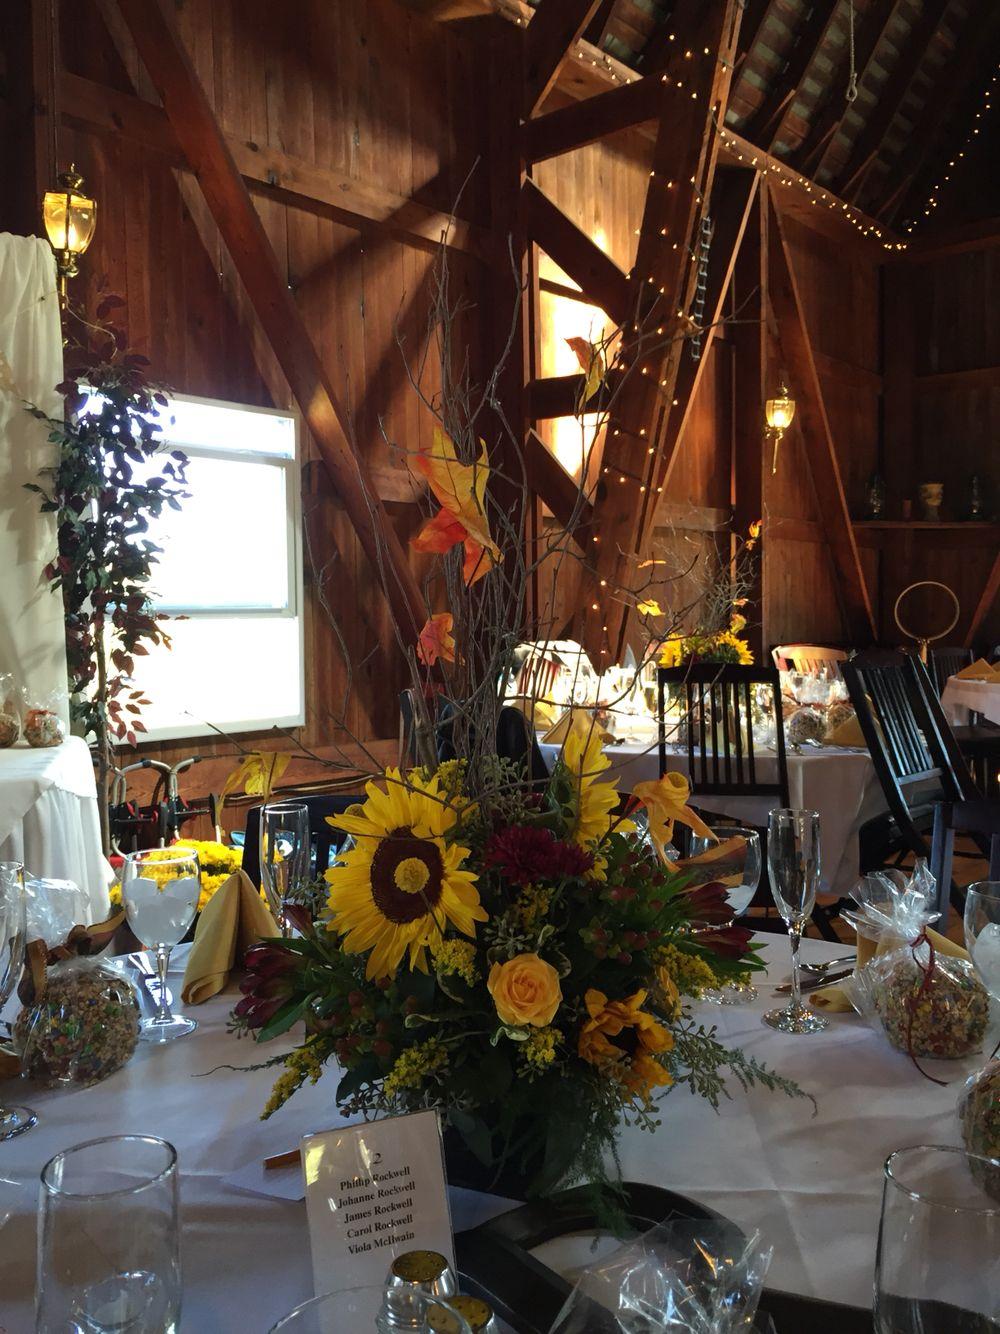 Barn Weddings. The Barn at Hillsprings Farm is the perfect ...